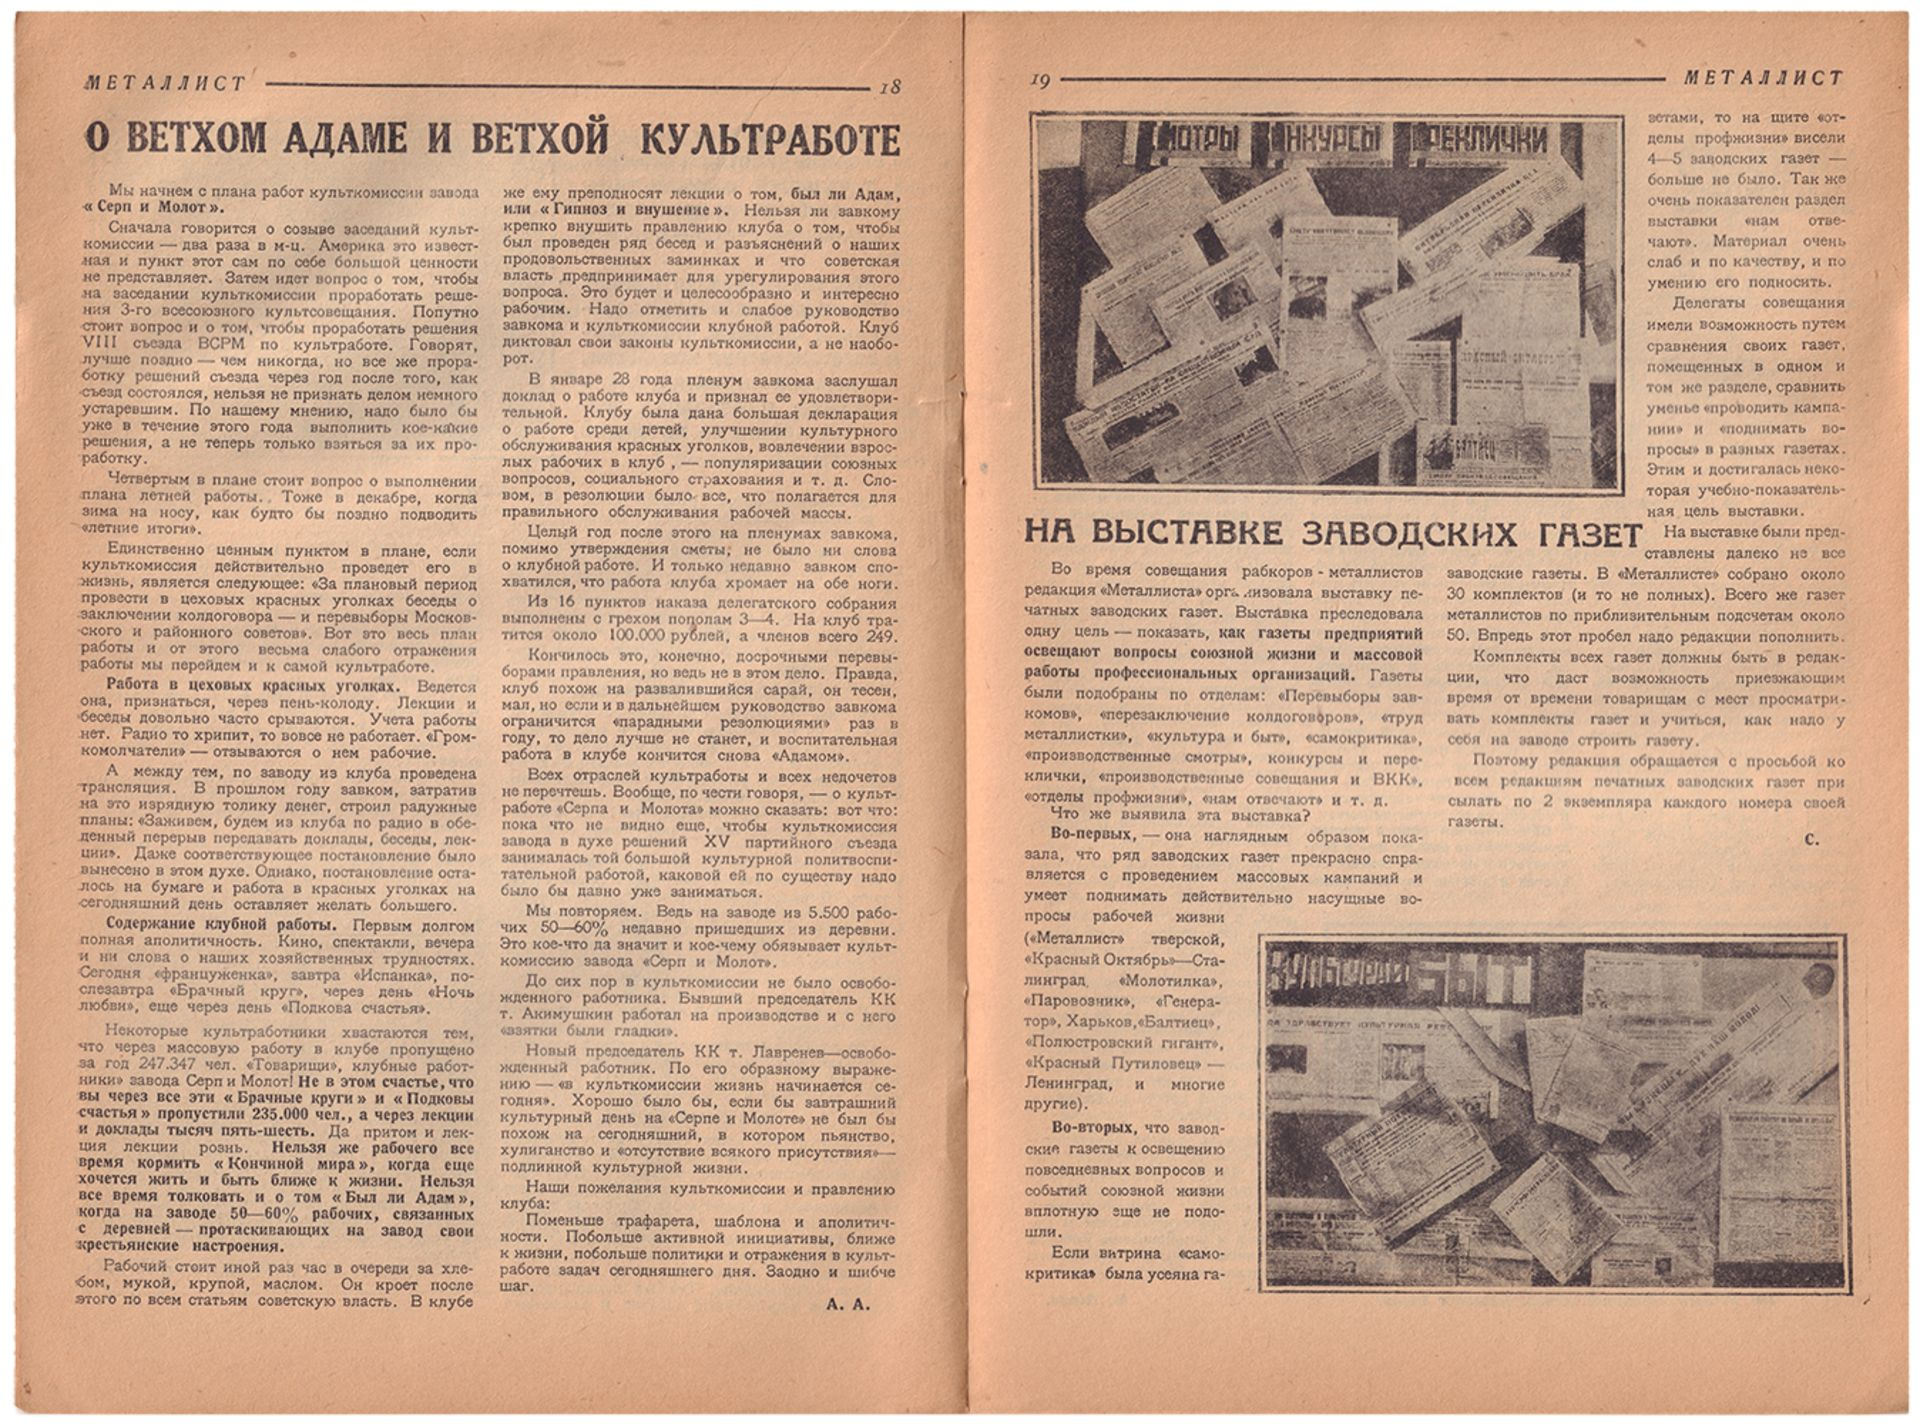 [Soviet art]. Metalworker. Issue 48th. Moscow, 1928. - [1], 32, [1] pp.: ill.; 25,2x7,5 cm.<br>Origi - Bild 3 aus 3